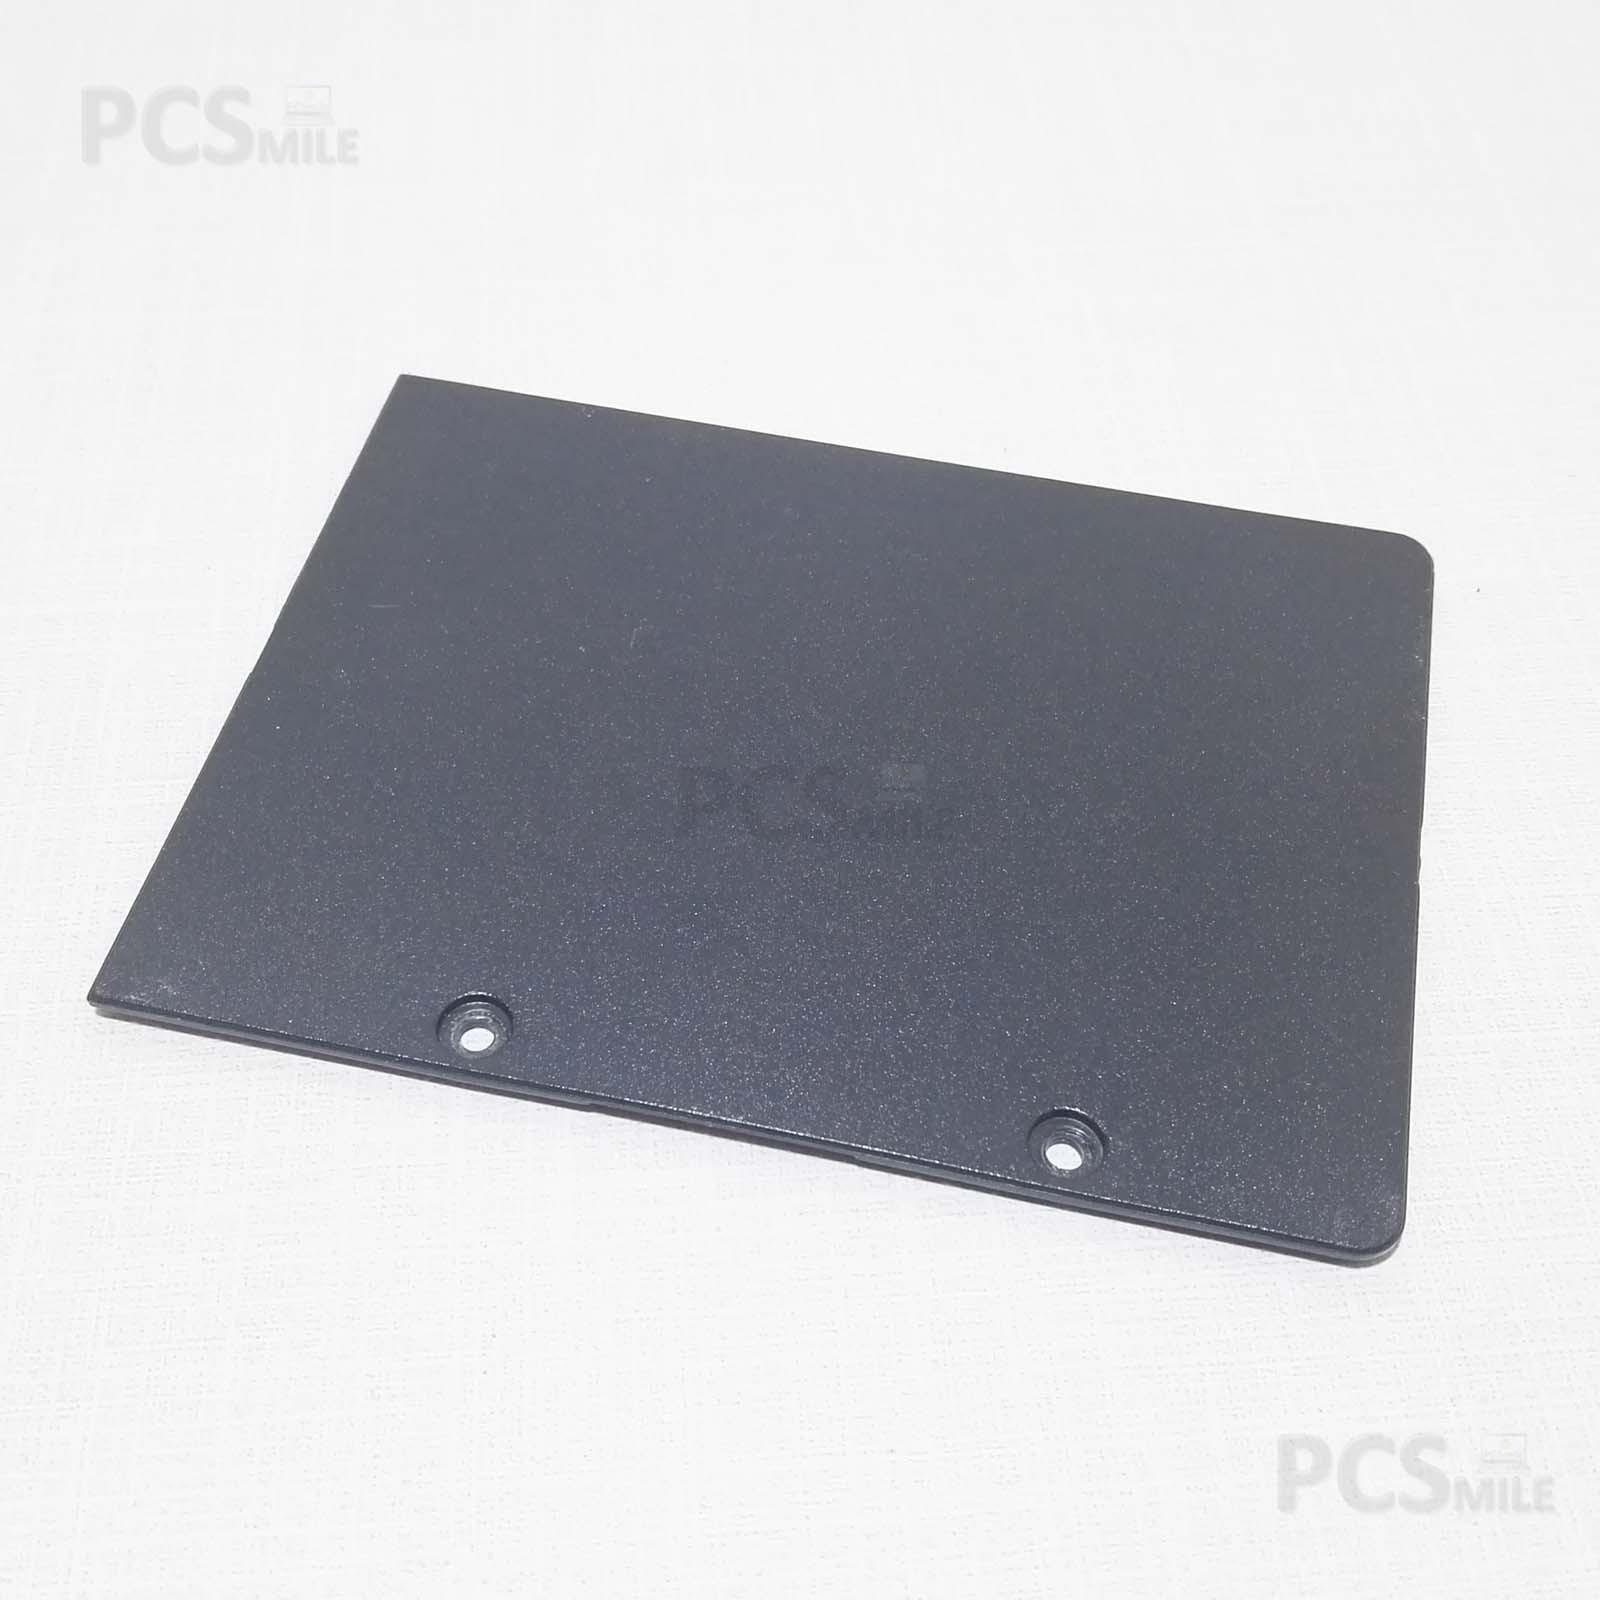 Sportellino posteriore hard disk Acer Aspire 9500 AZJYOOONOO